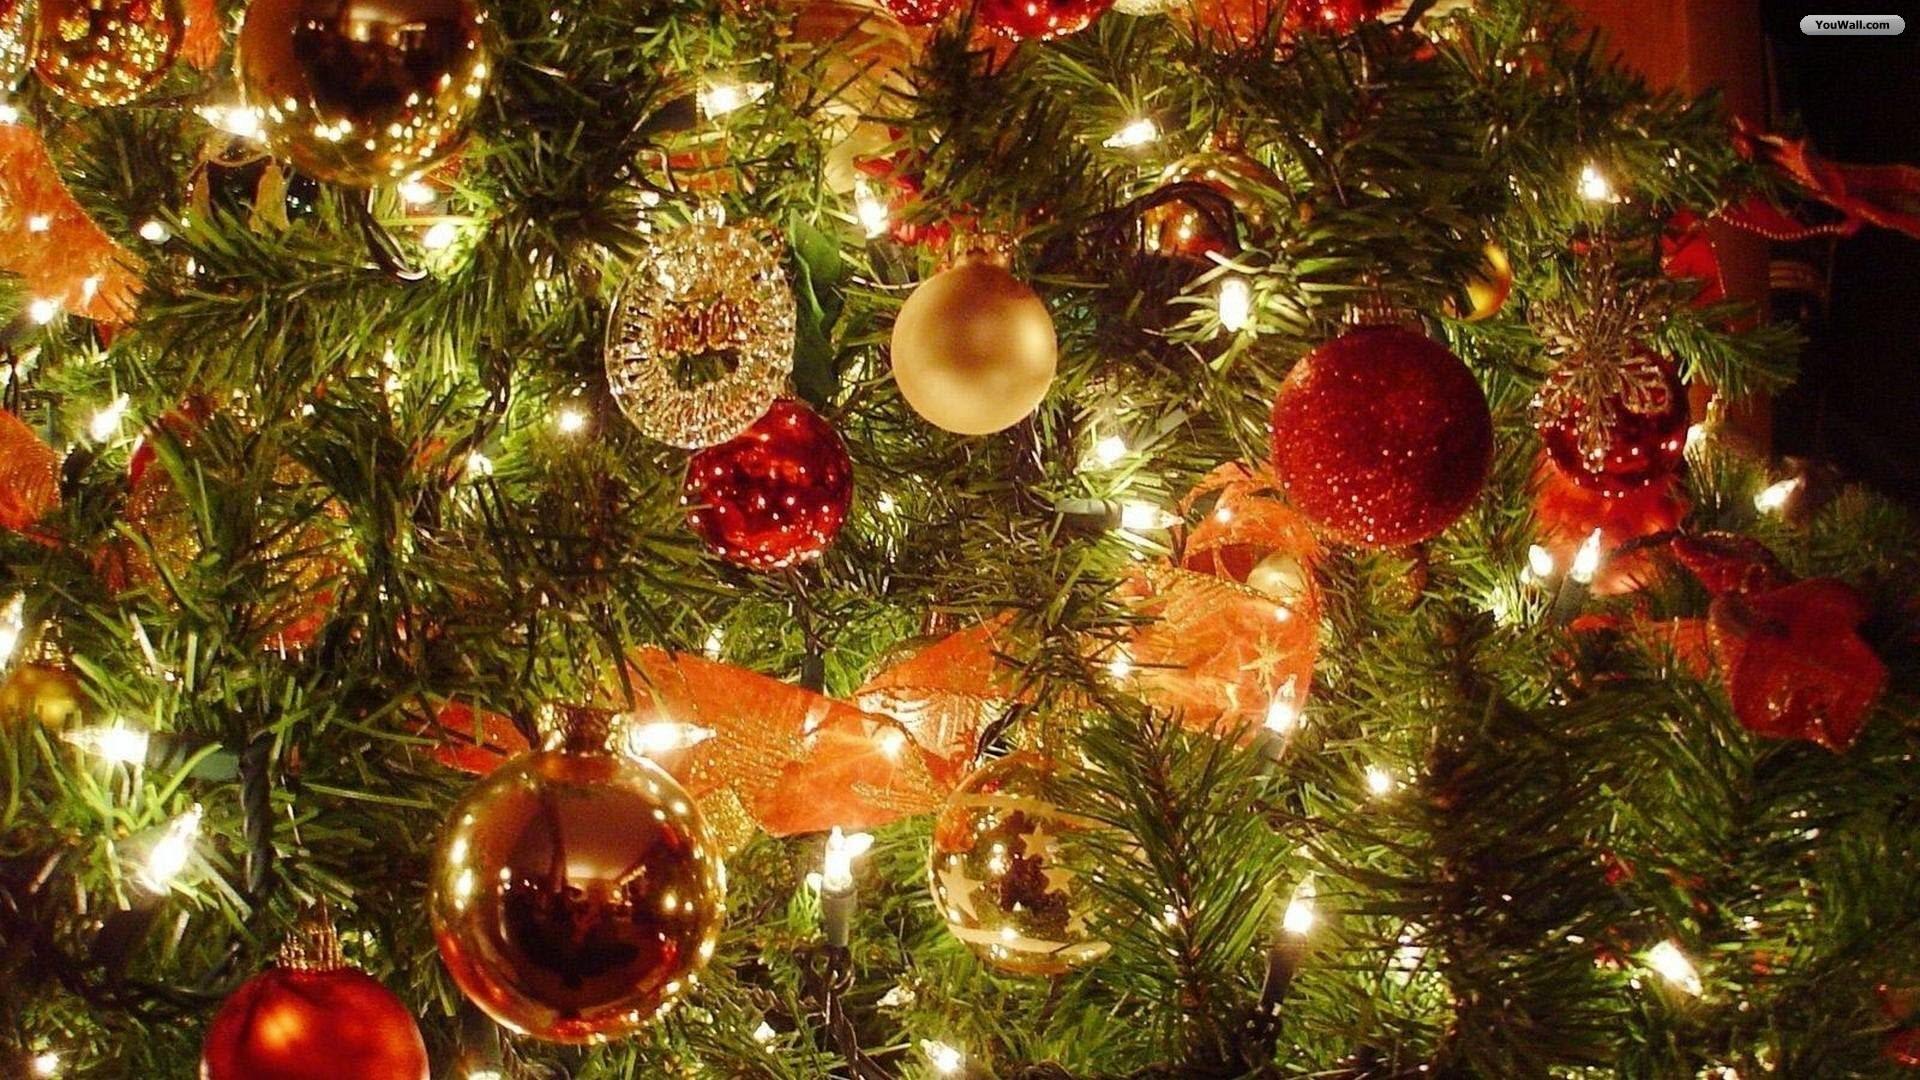 Christmas Tree Desktop Background 1